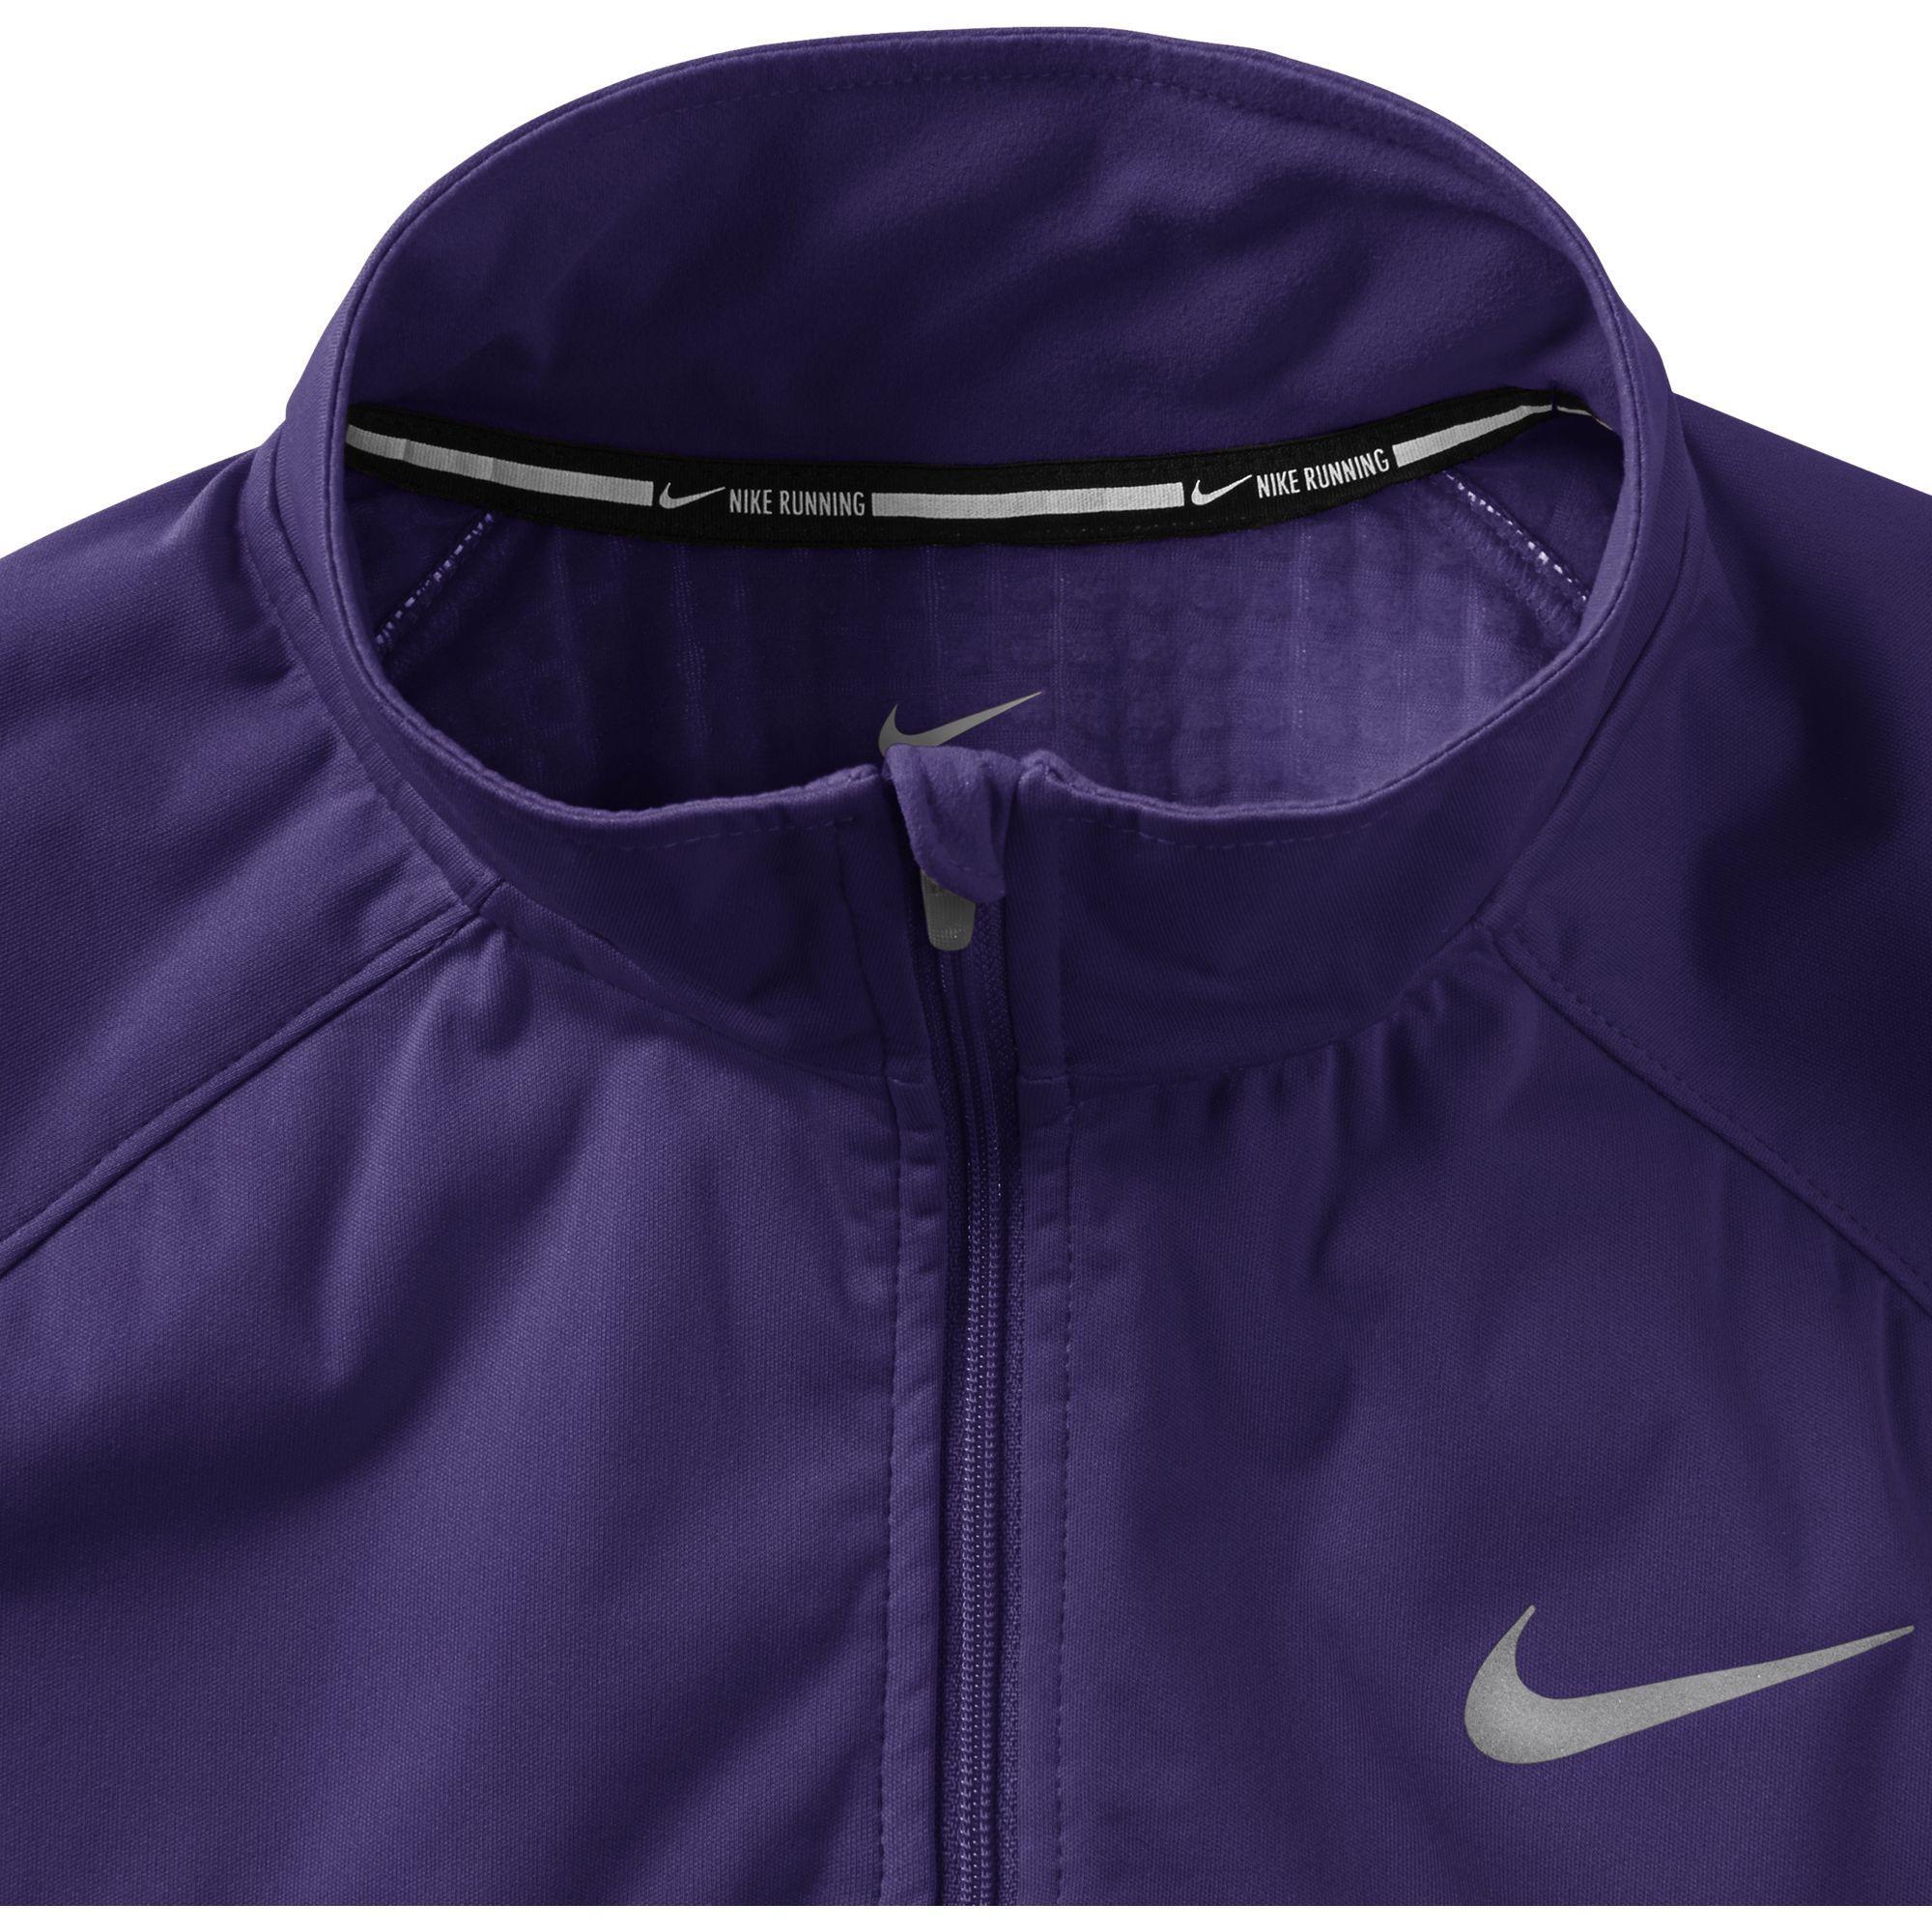 b0f8194b5f9e Nike Womens Element Shield FZ Jacket - Court Purple Reflective Silver